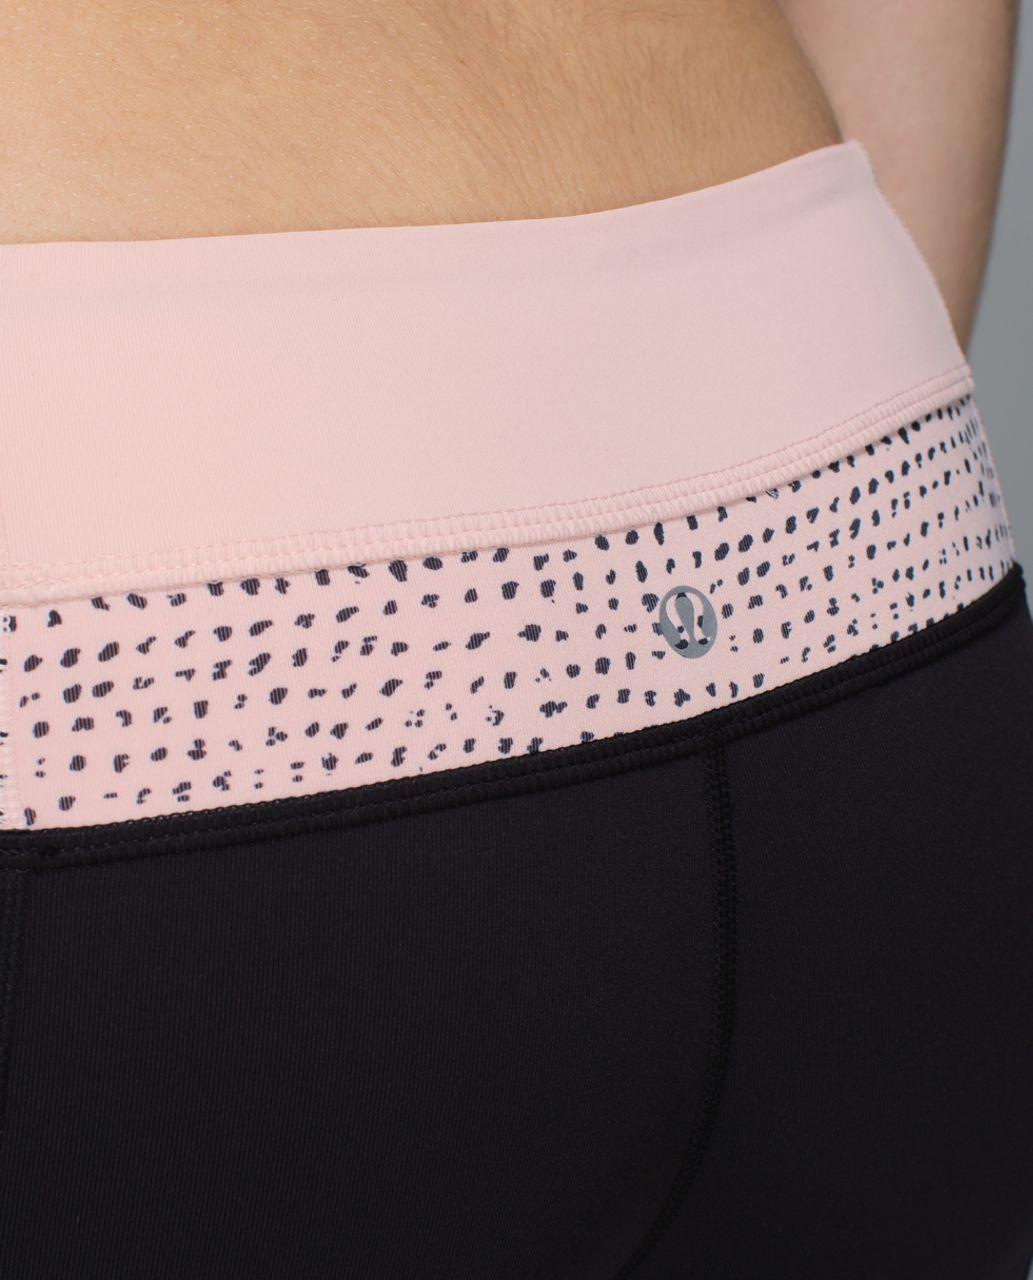 Lululemon Groove Pant *Full-On Luon (Regular) - Black / Parfait Pink / Speckle Dot Parfait Pink Black